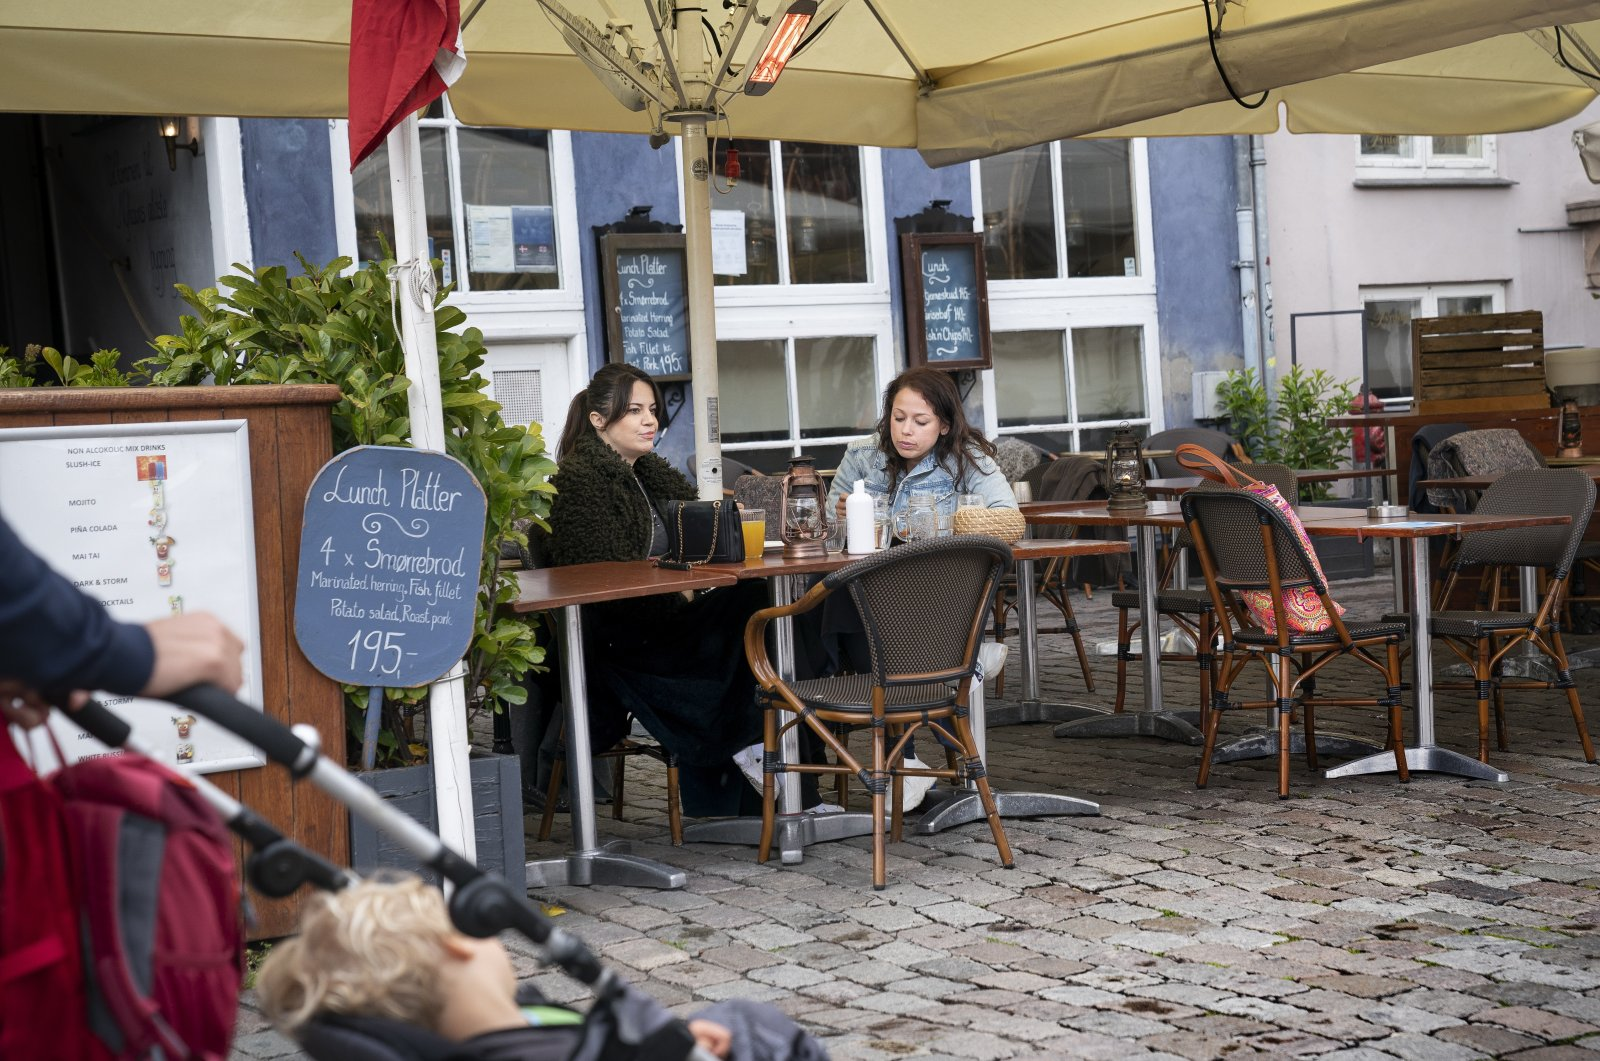 People sit at a restaurant in Copenhagen, Denmark, May 18, 2020. (EPA Photo)